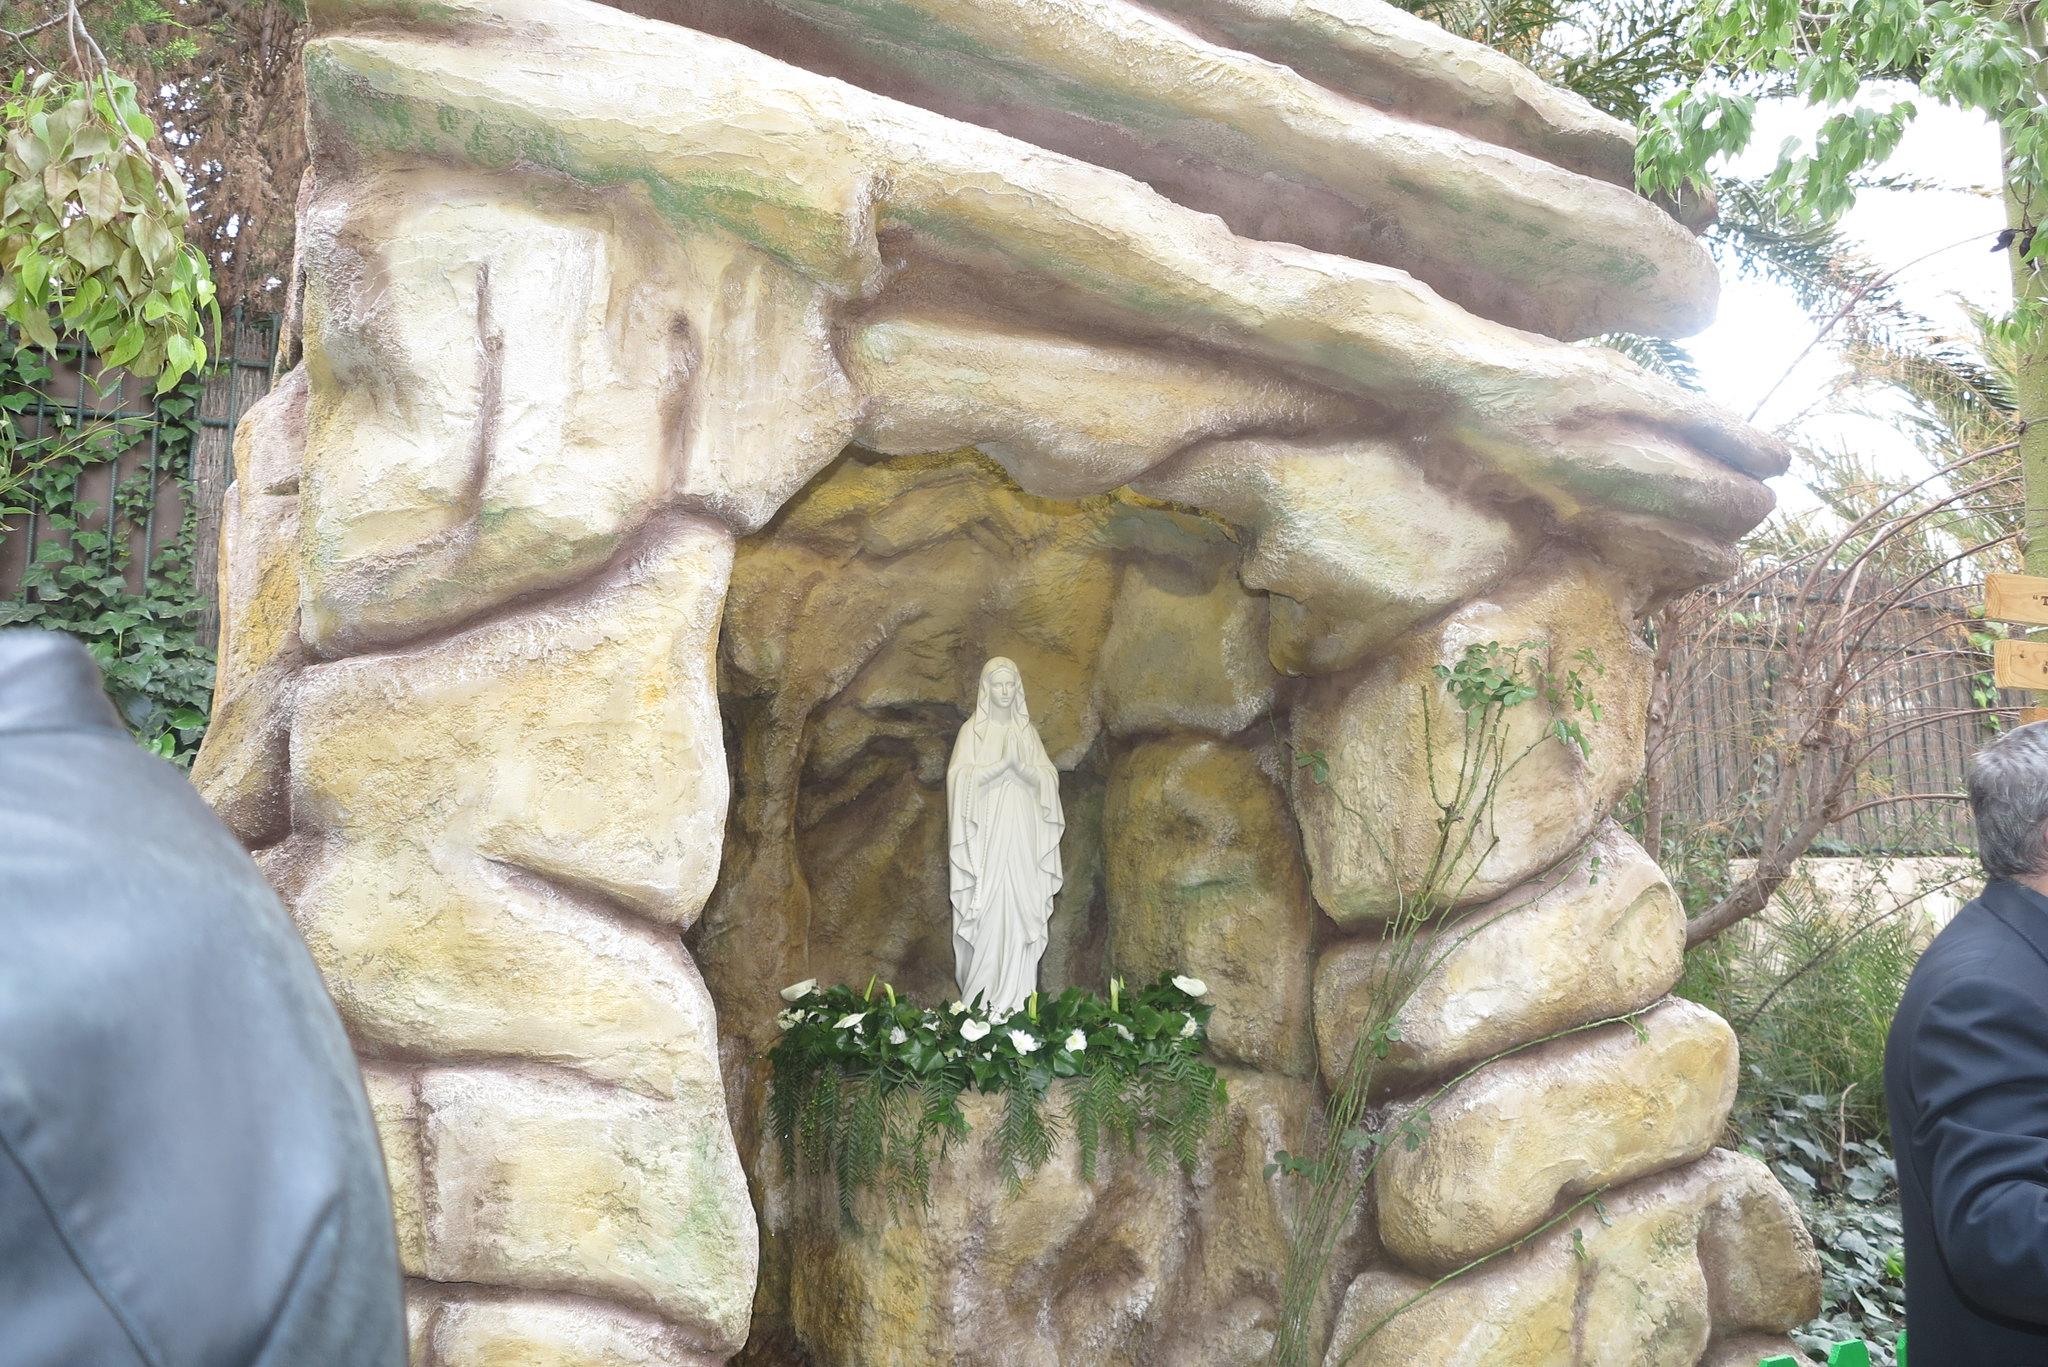 (2016-02-13) - Inauguración Virgen de Lourdes, La Molineta - Archivo La Molineta 2 (45)